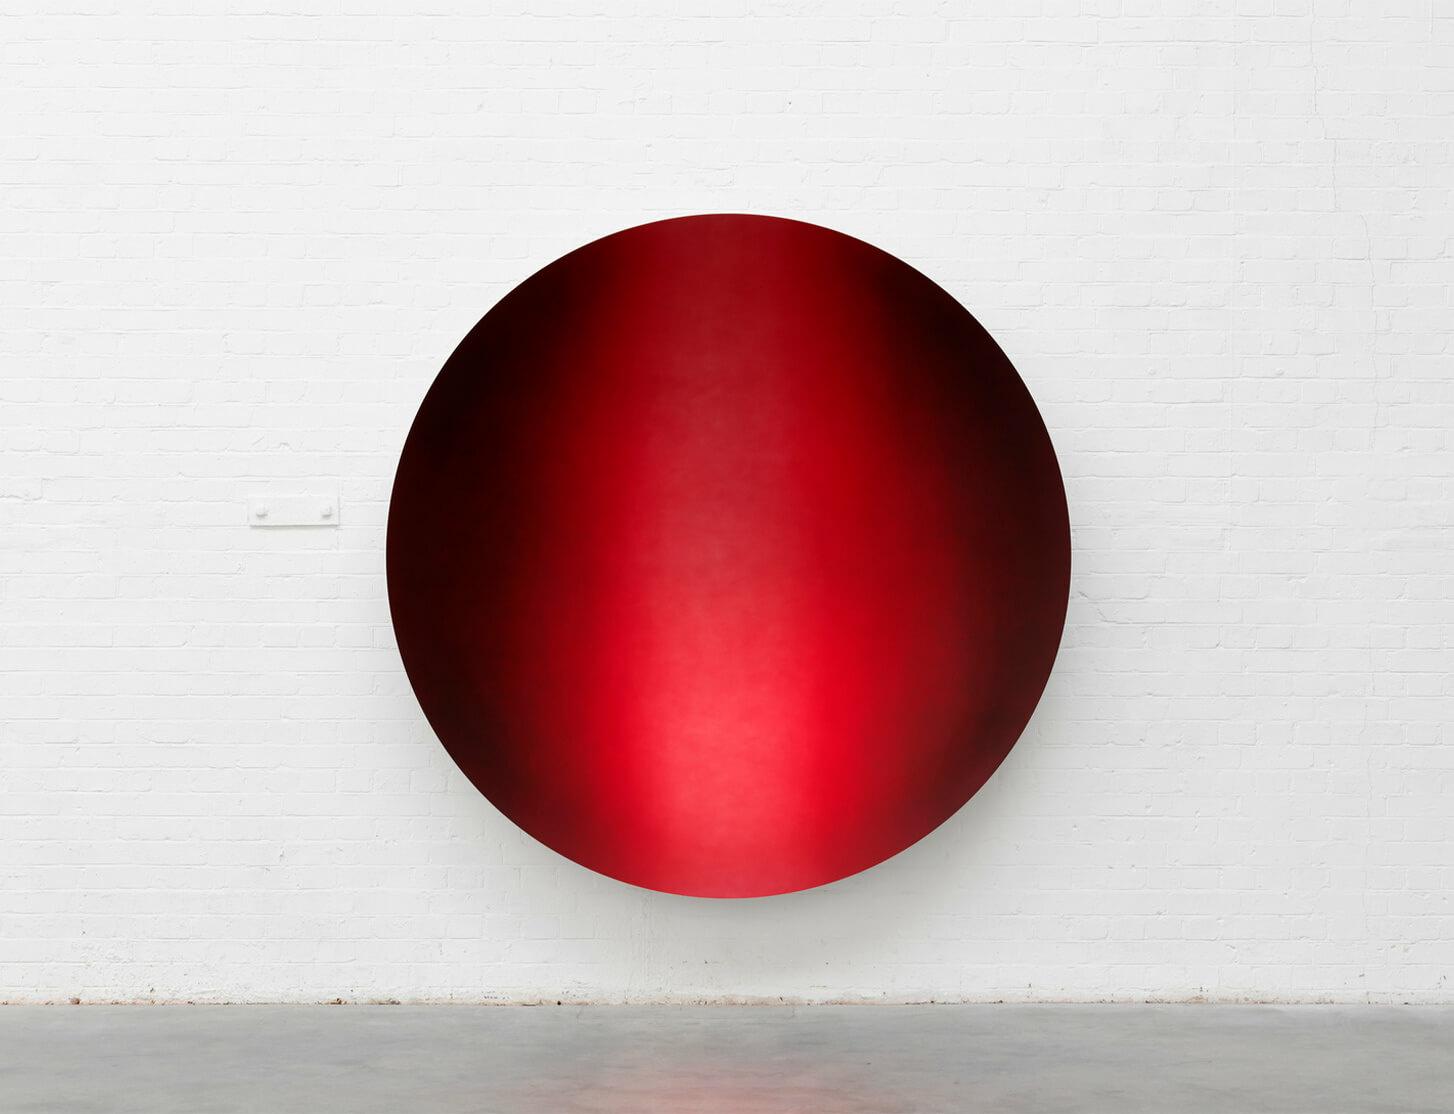 Lisson Gallery returns to Art Basel Miami Beach